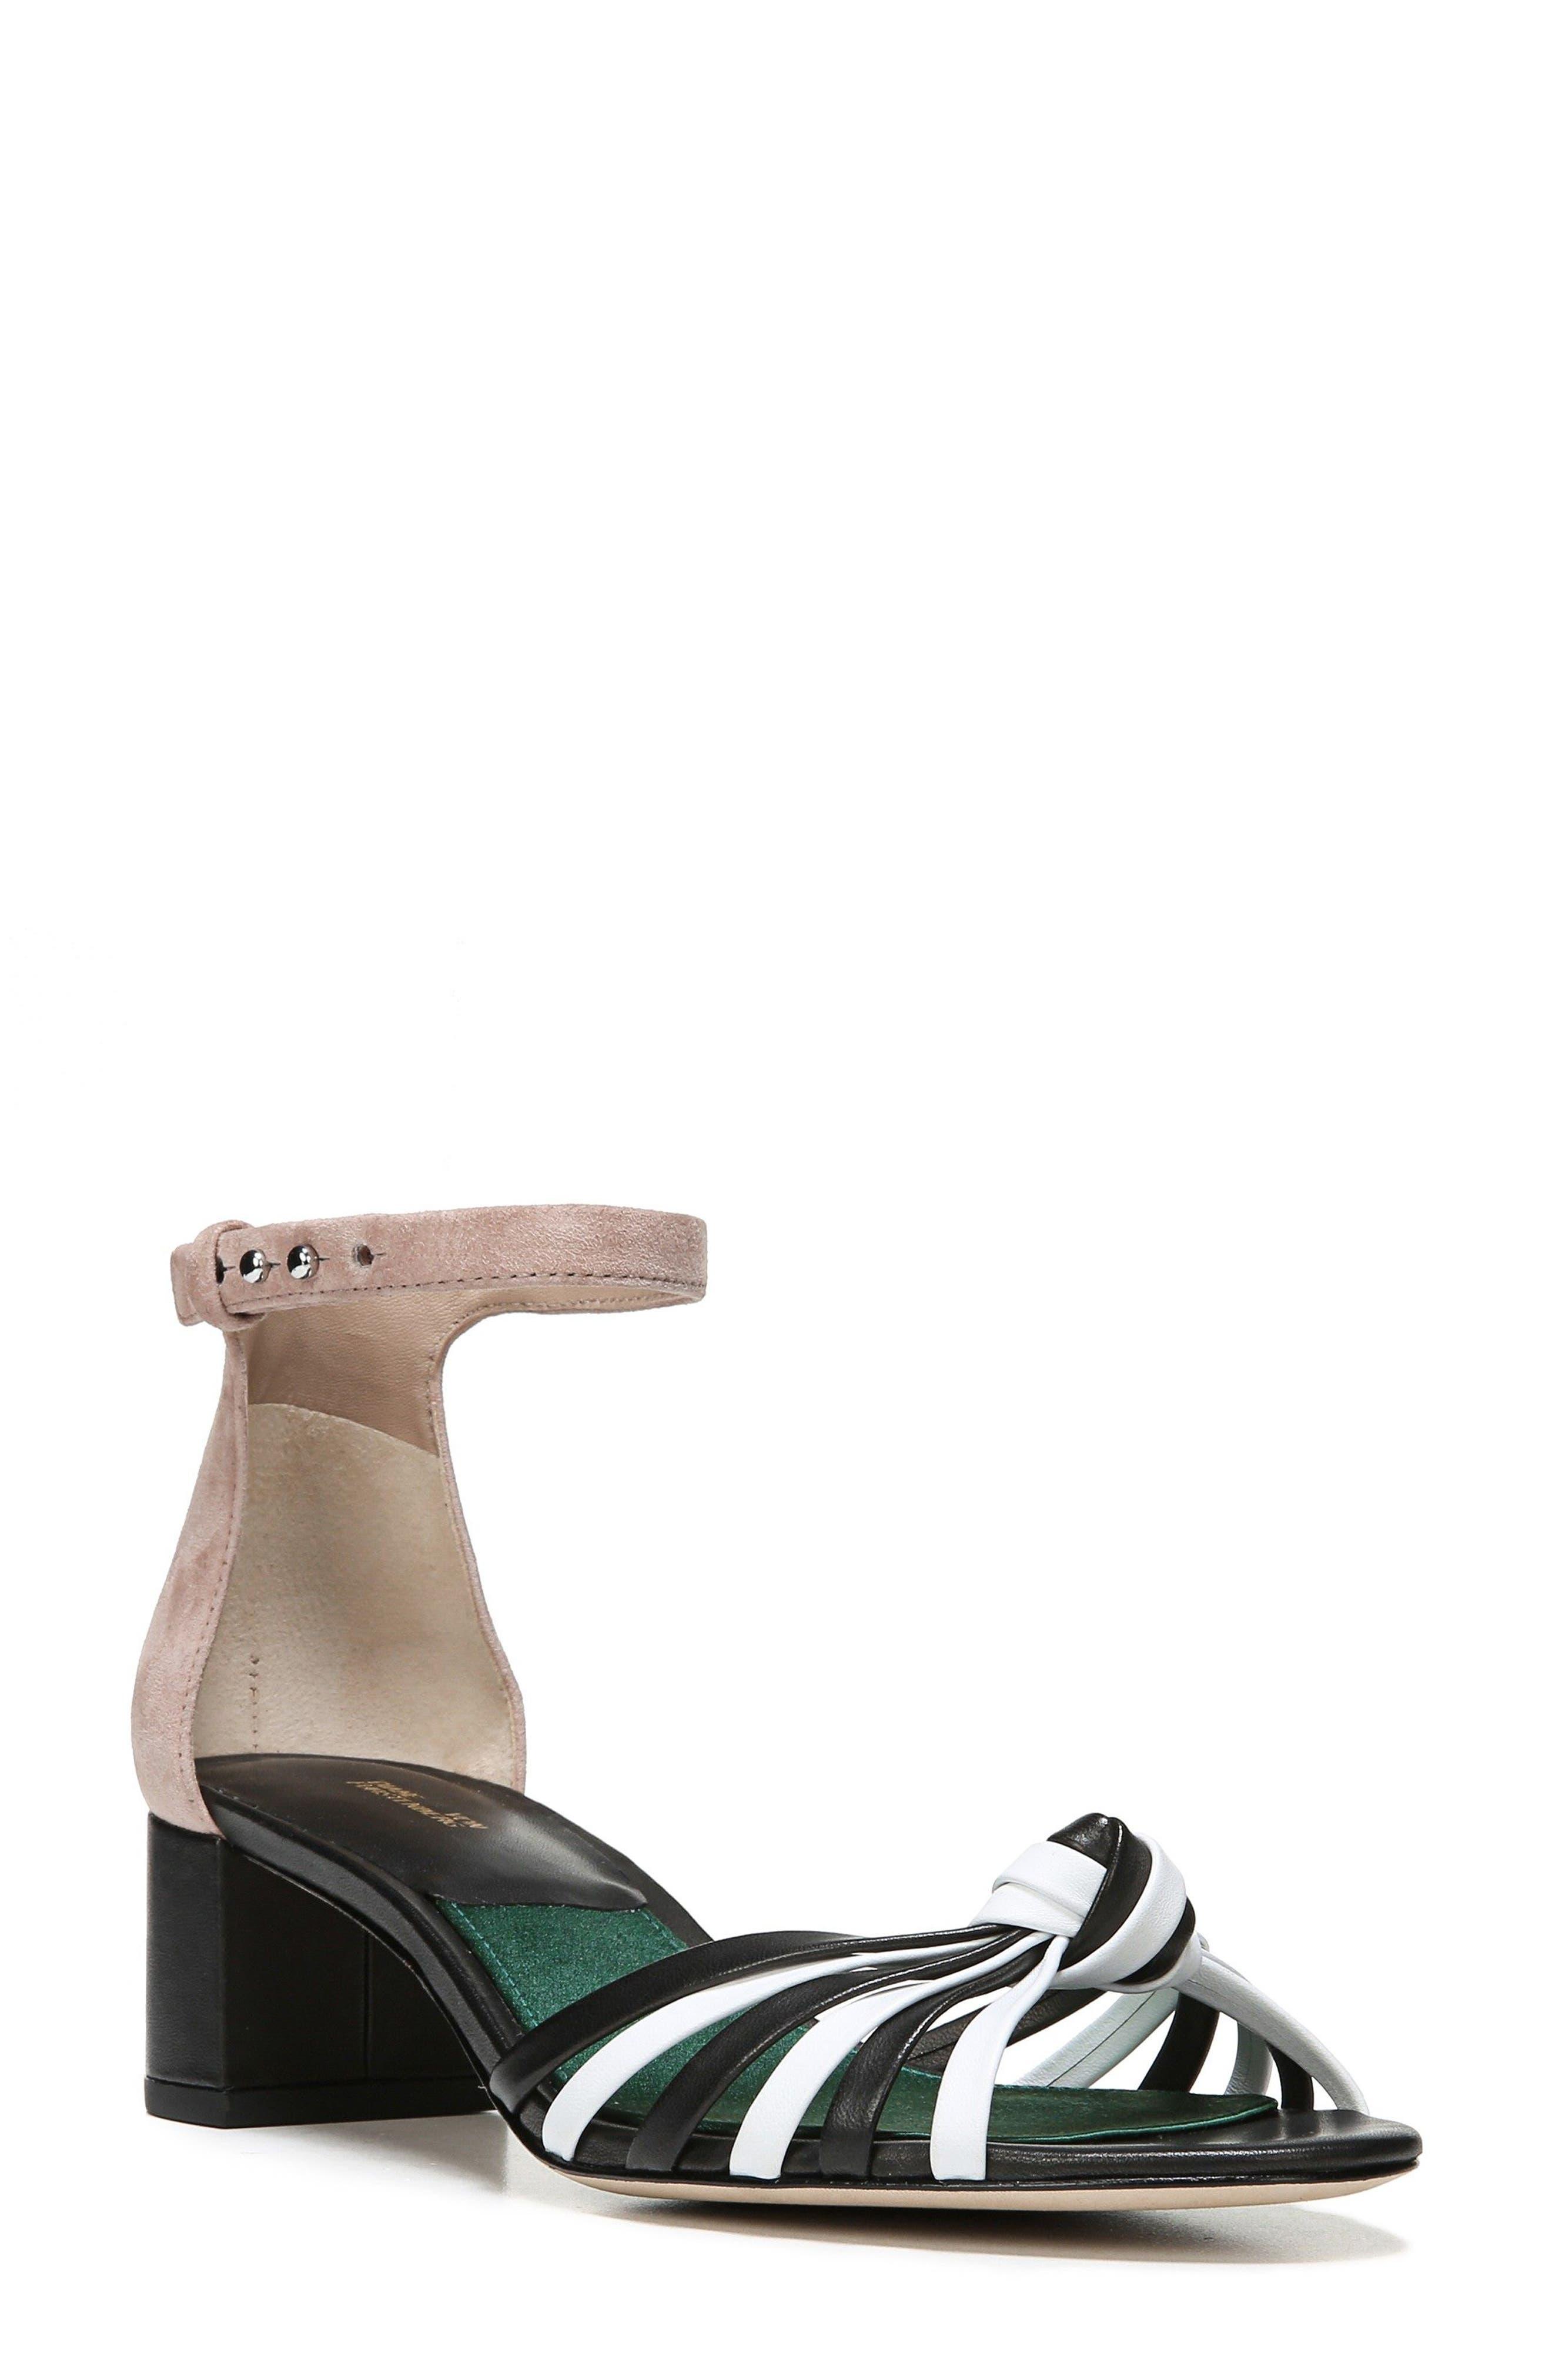 Fonseca Ankle Strap Sandal,                             Main thumbnail 1, color,                             001